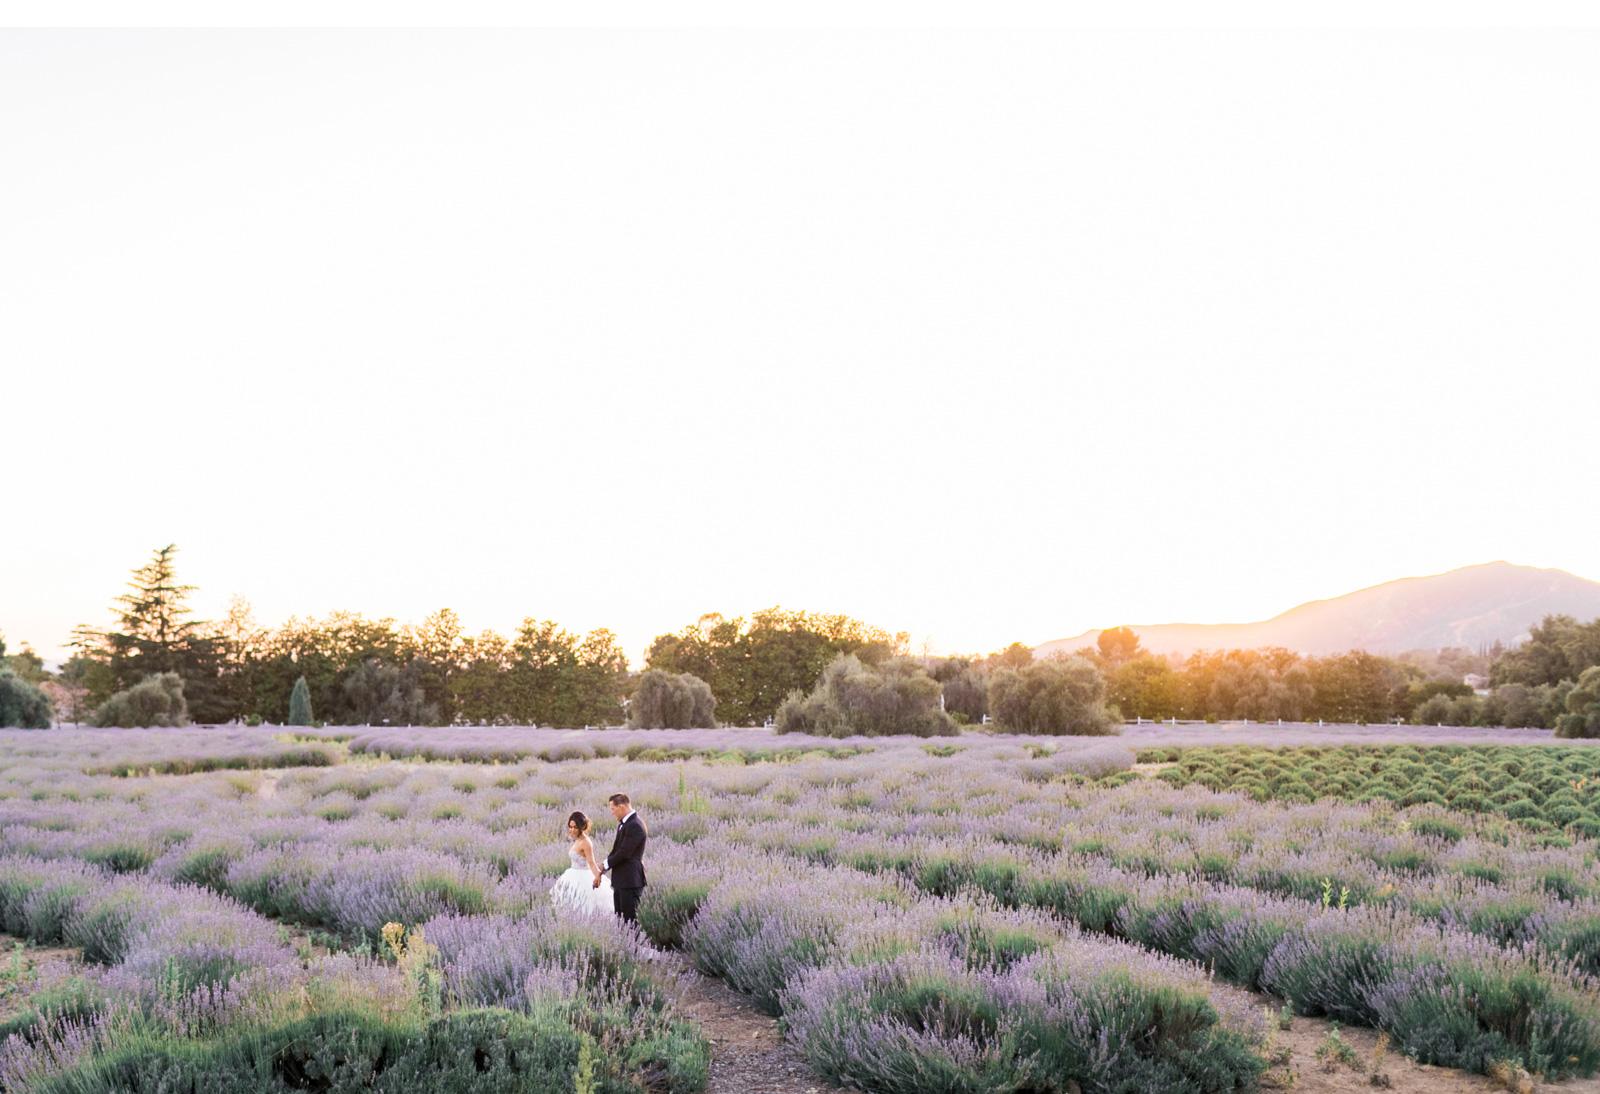 California-Lavender-Field-Wedding-Natalie-Schutt-Photography-Style-Me-Pretty_13.jpg